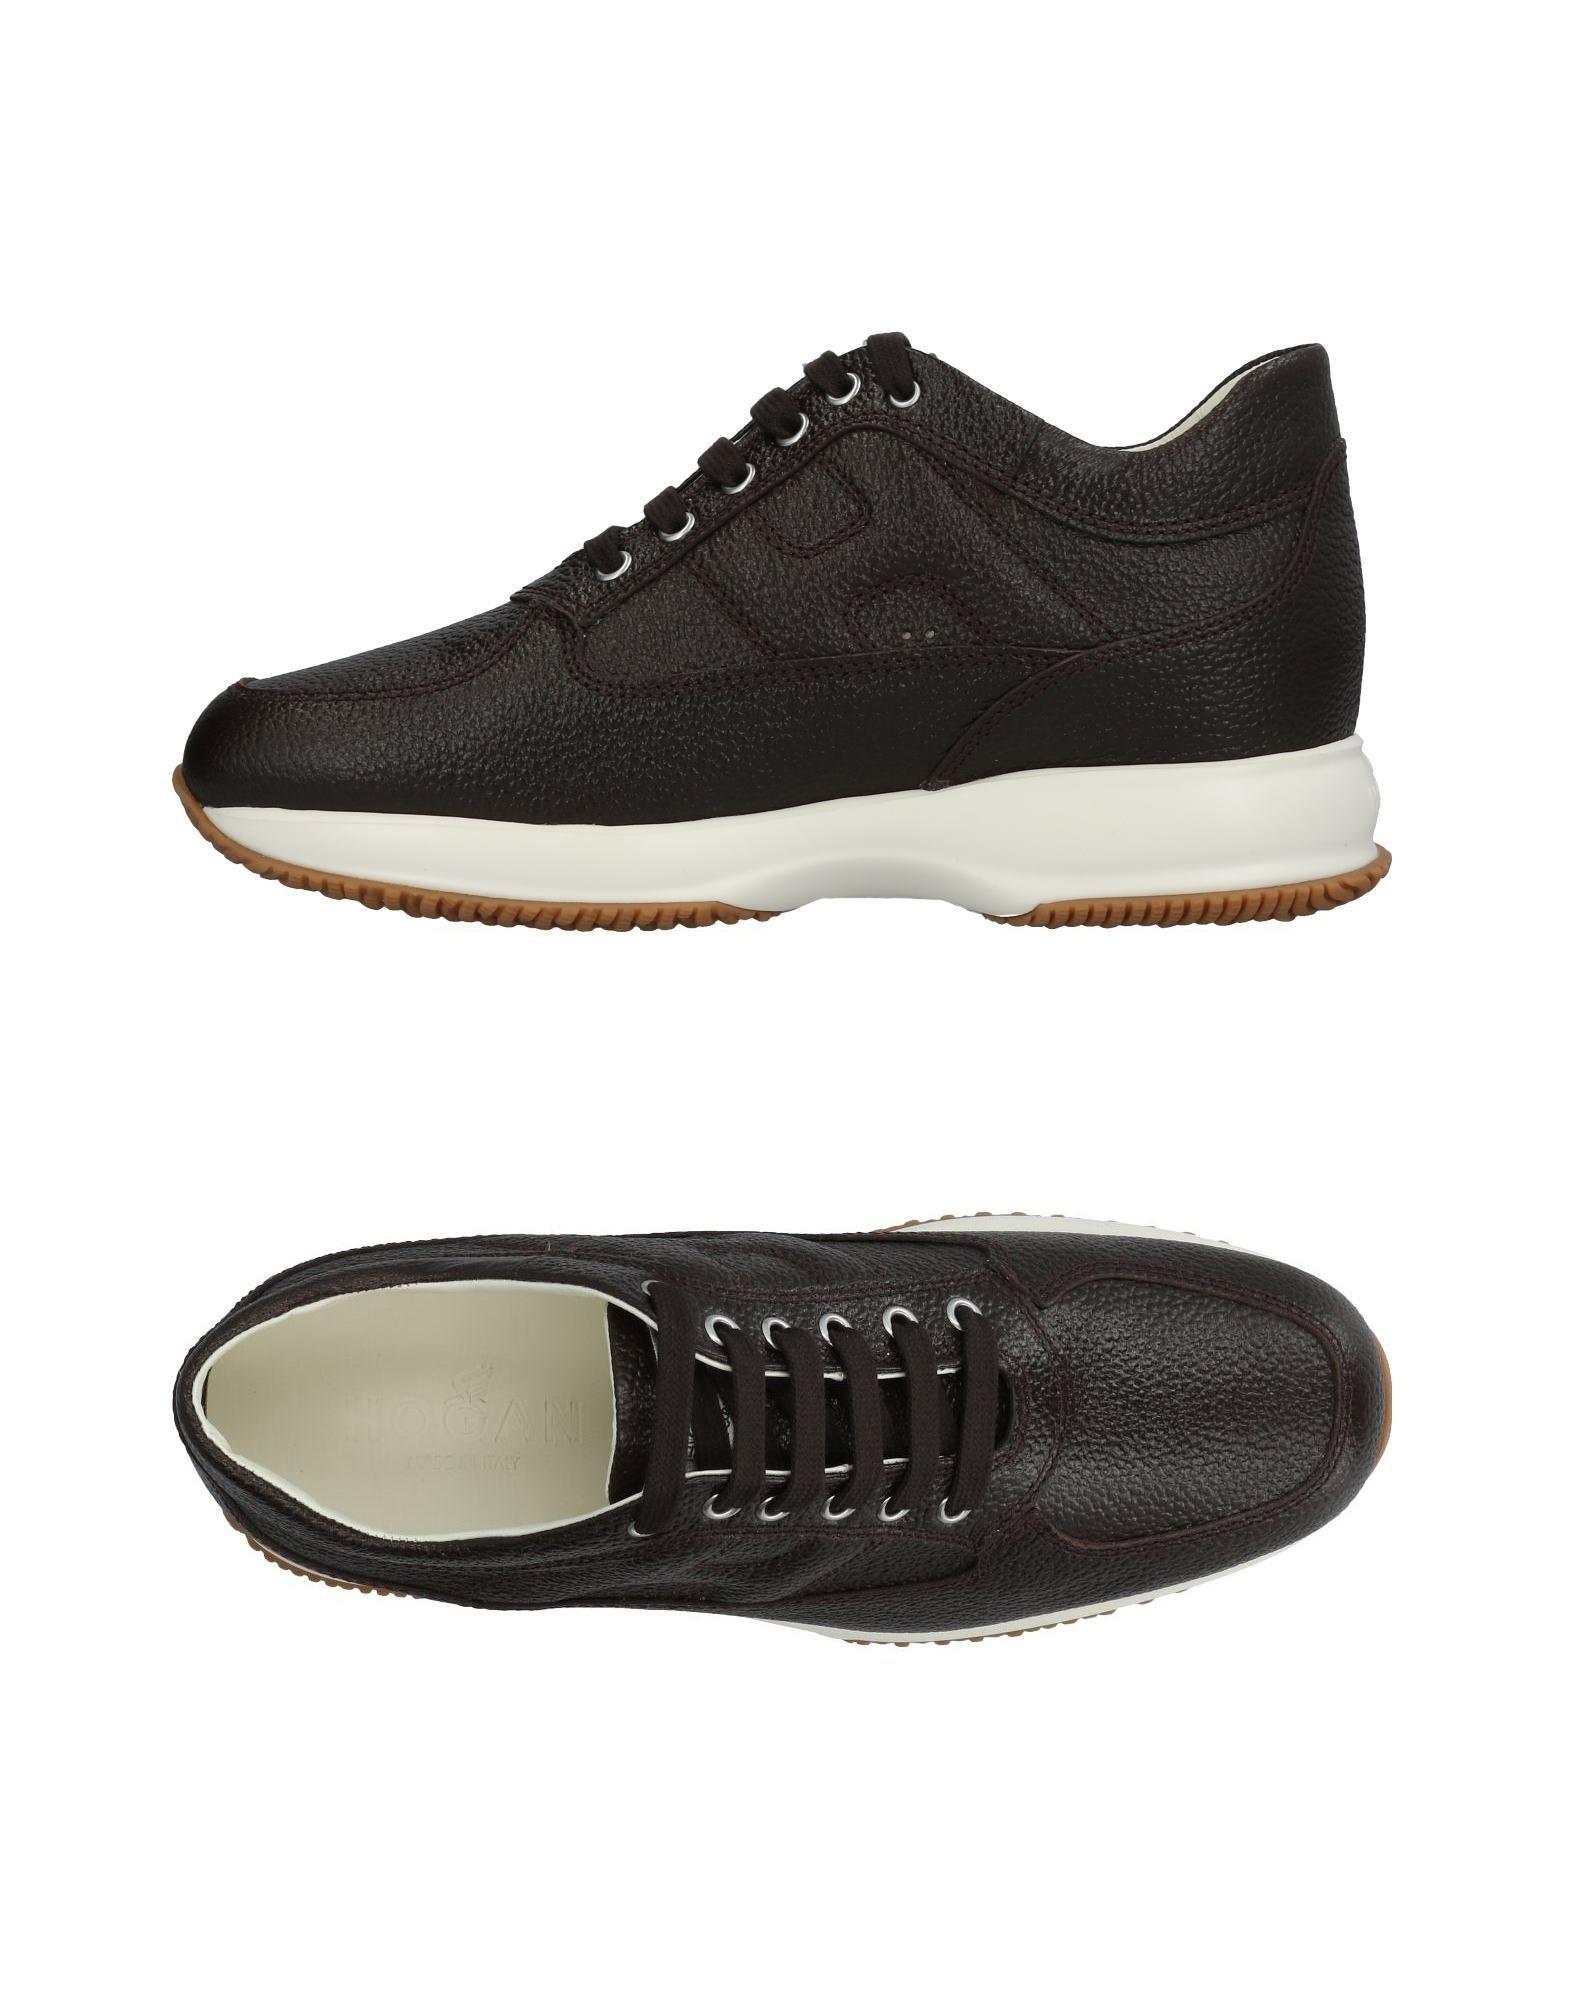 A buon mercato Sneakers Hogan Uomo - 11435704BM